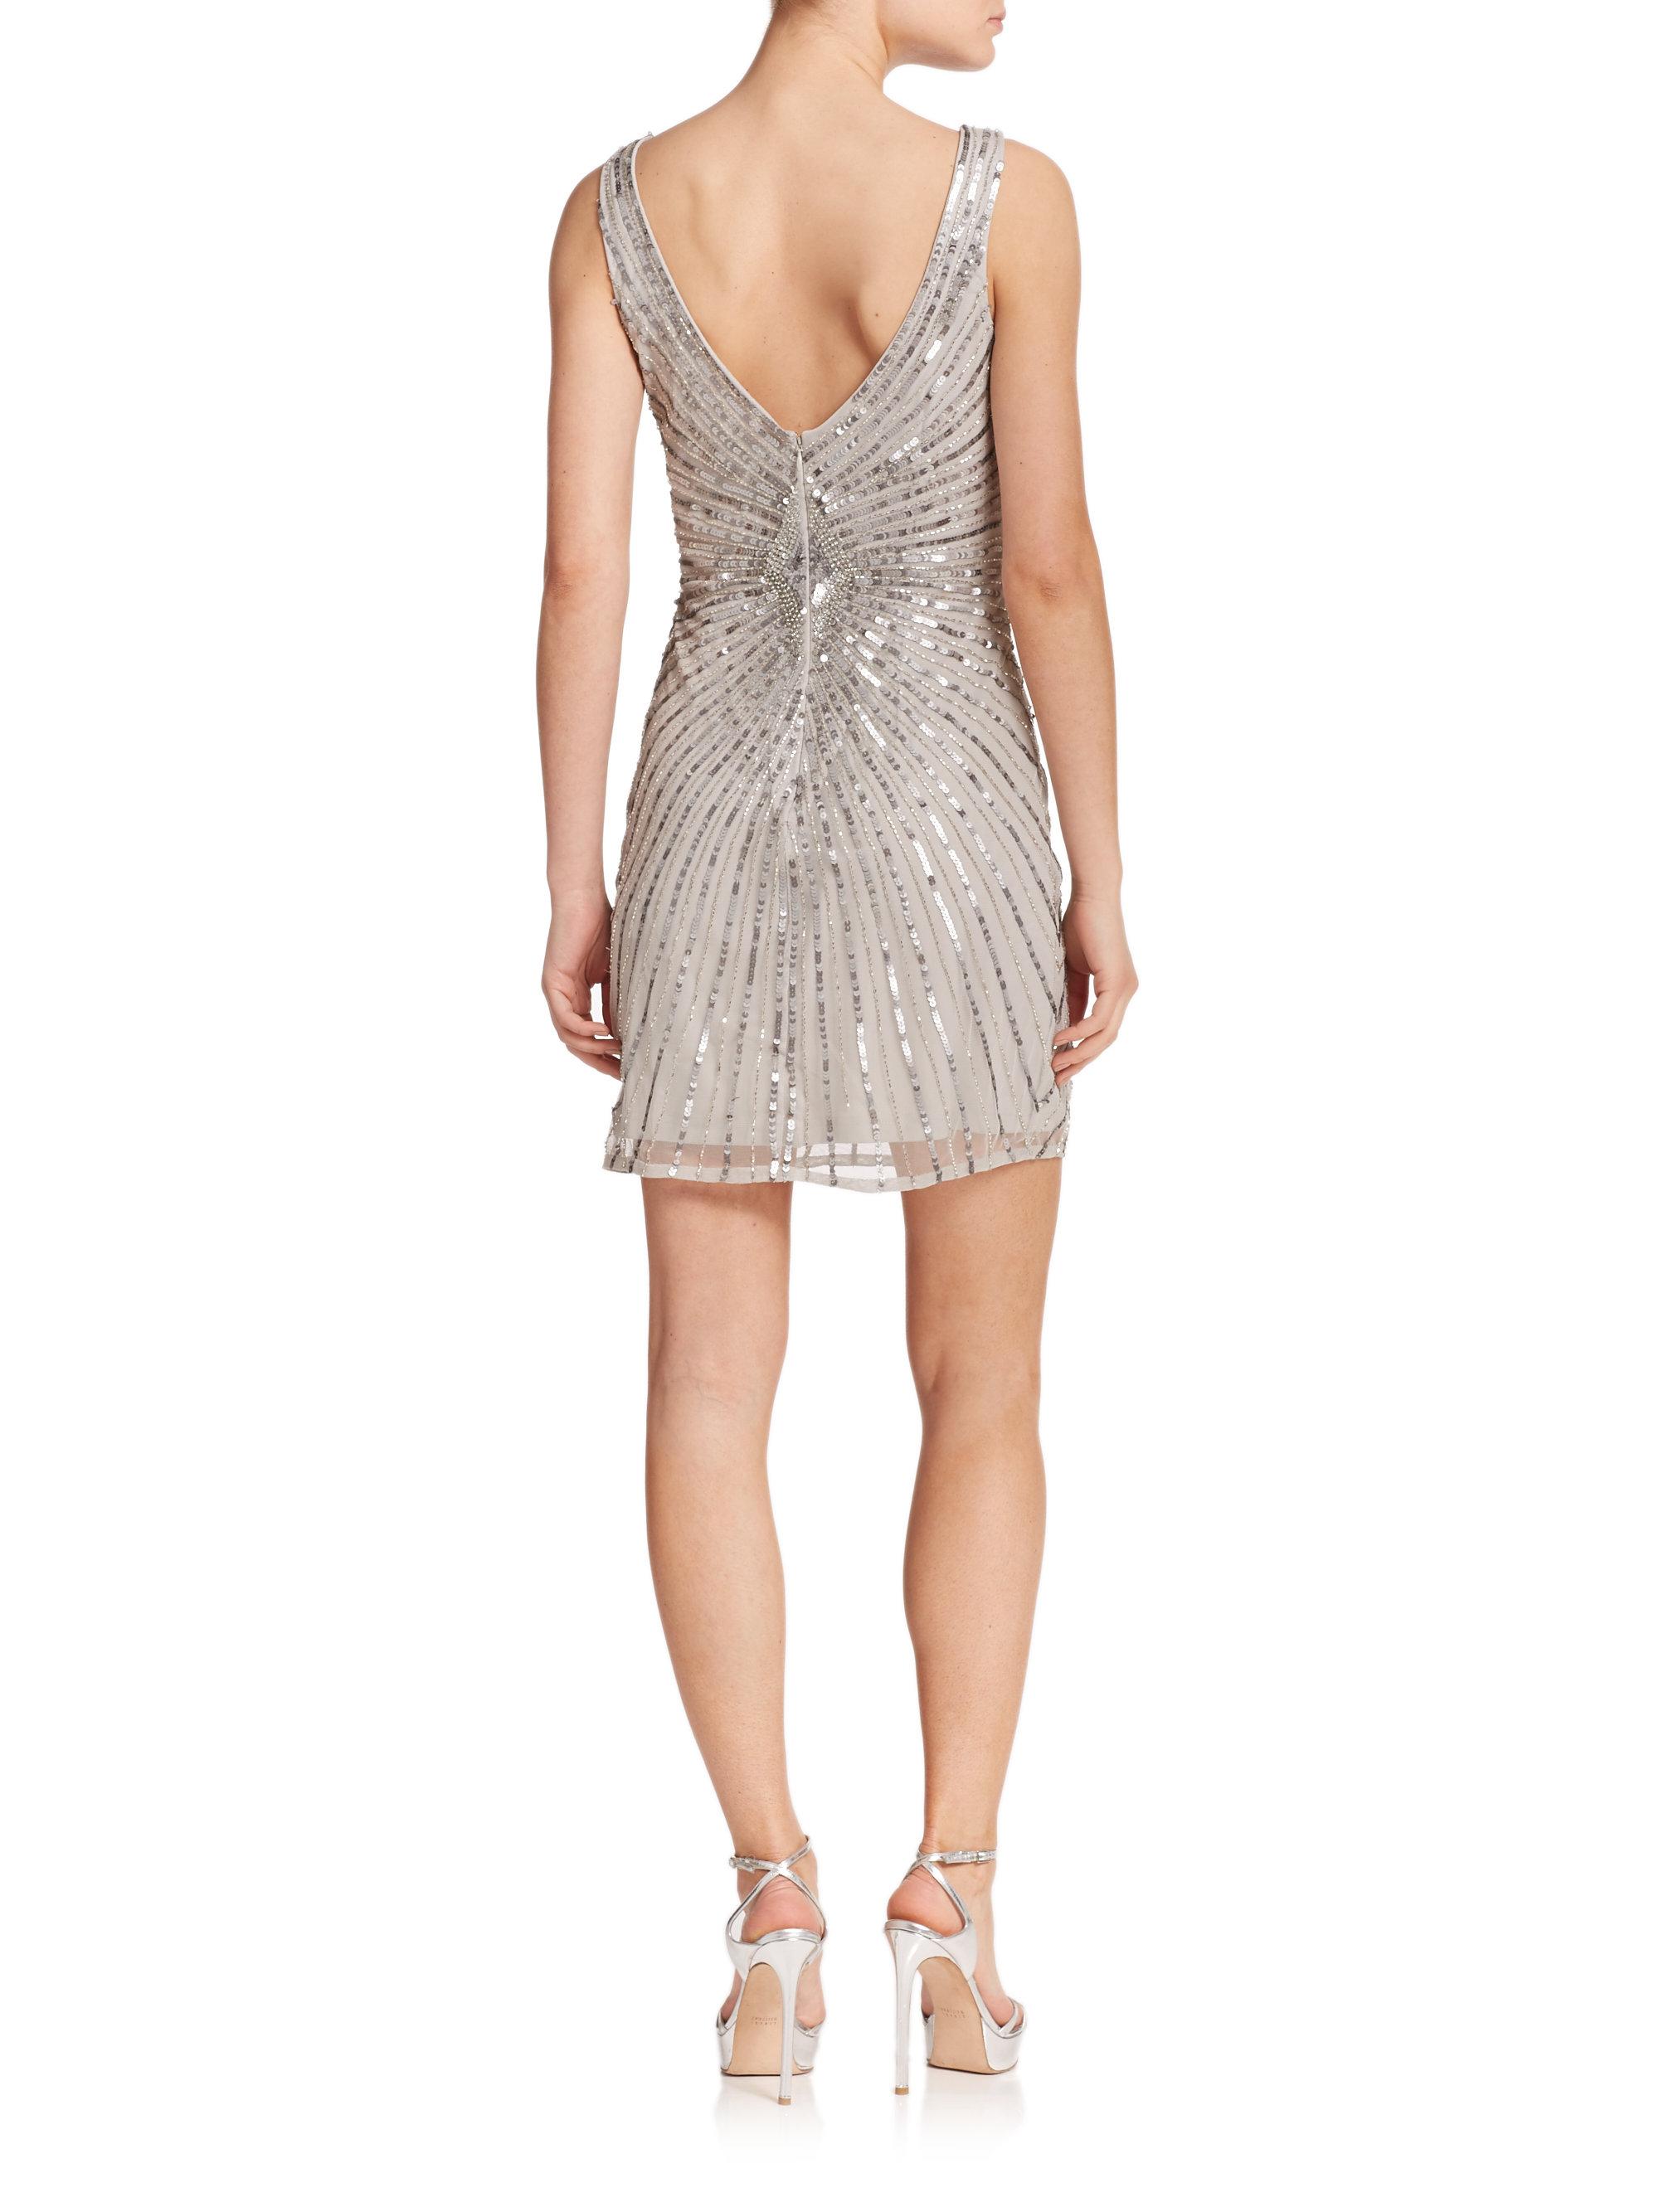 Gap Bridesmaid Dresses - Best Ideas Dress